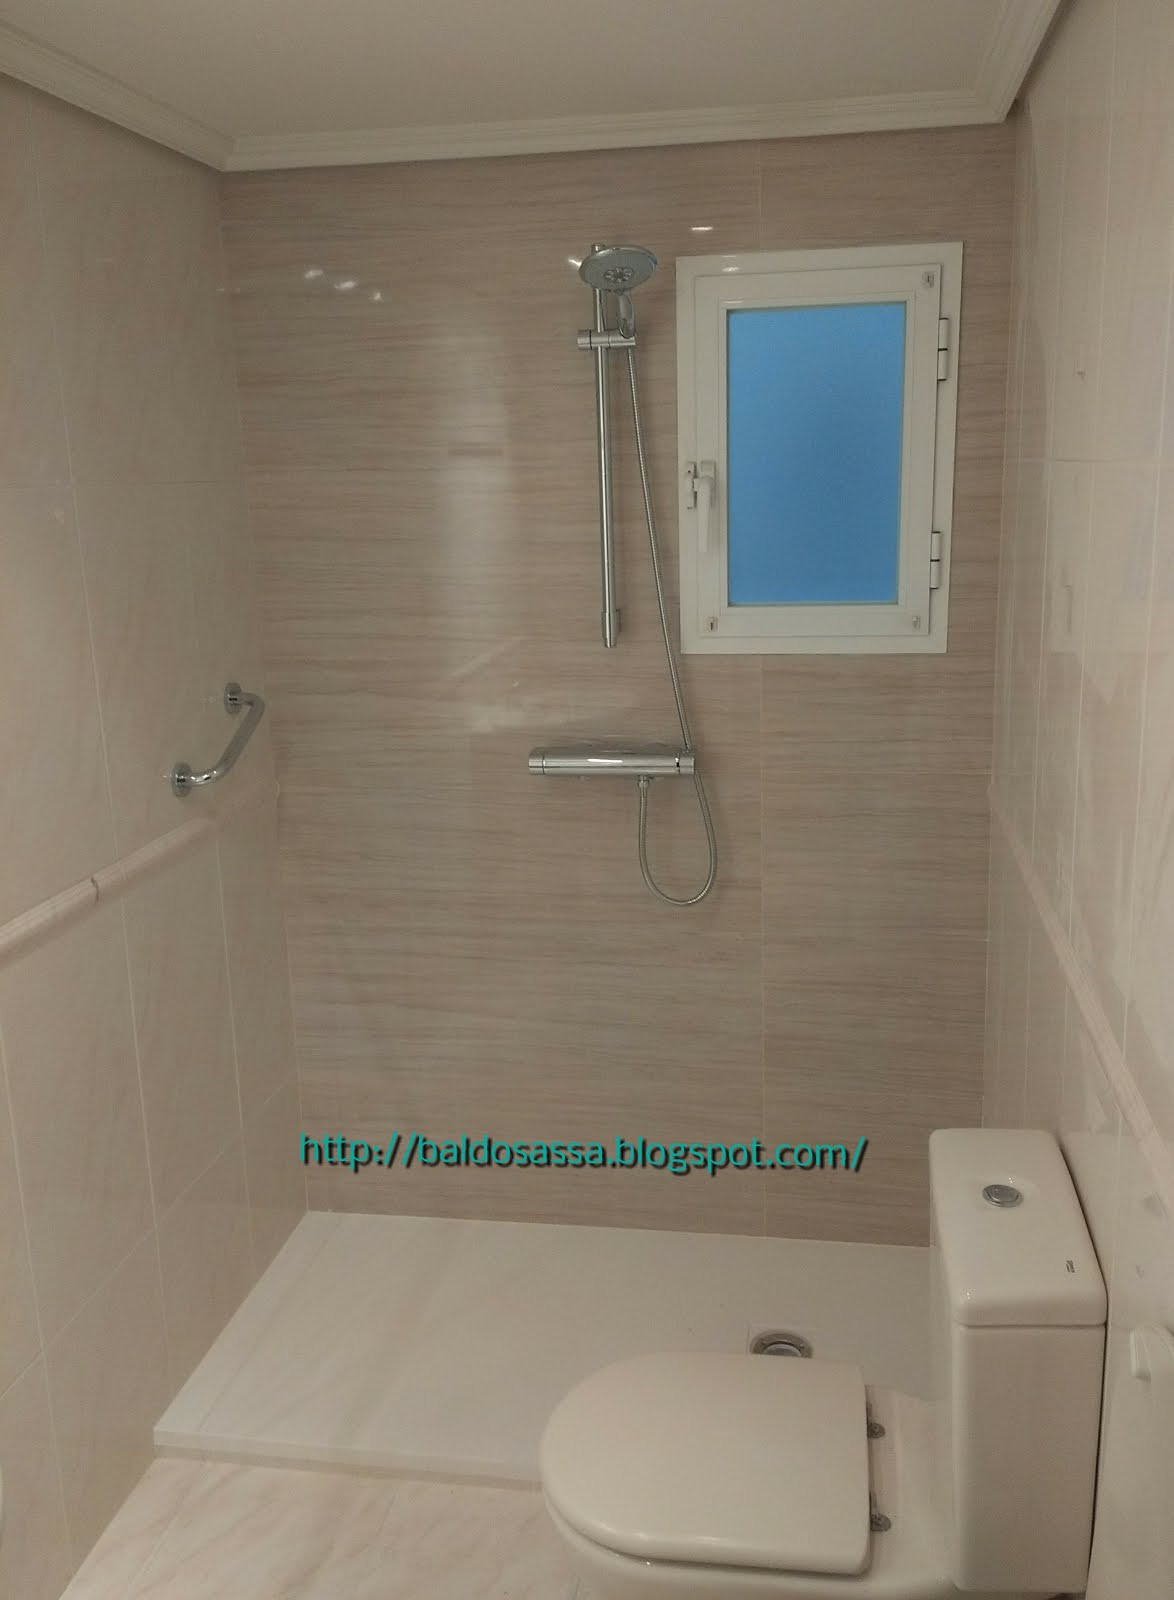 Cambio de bañera por plato de ducha carga mineral Kassandra